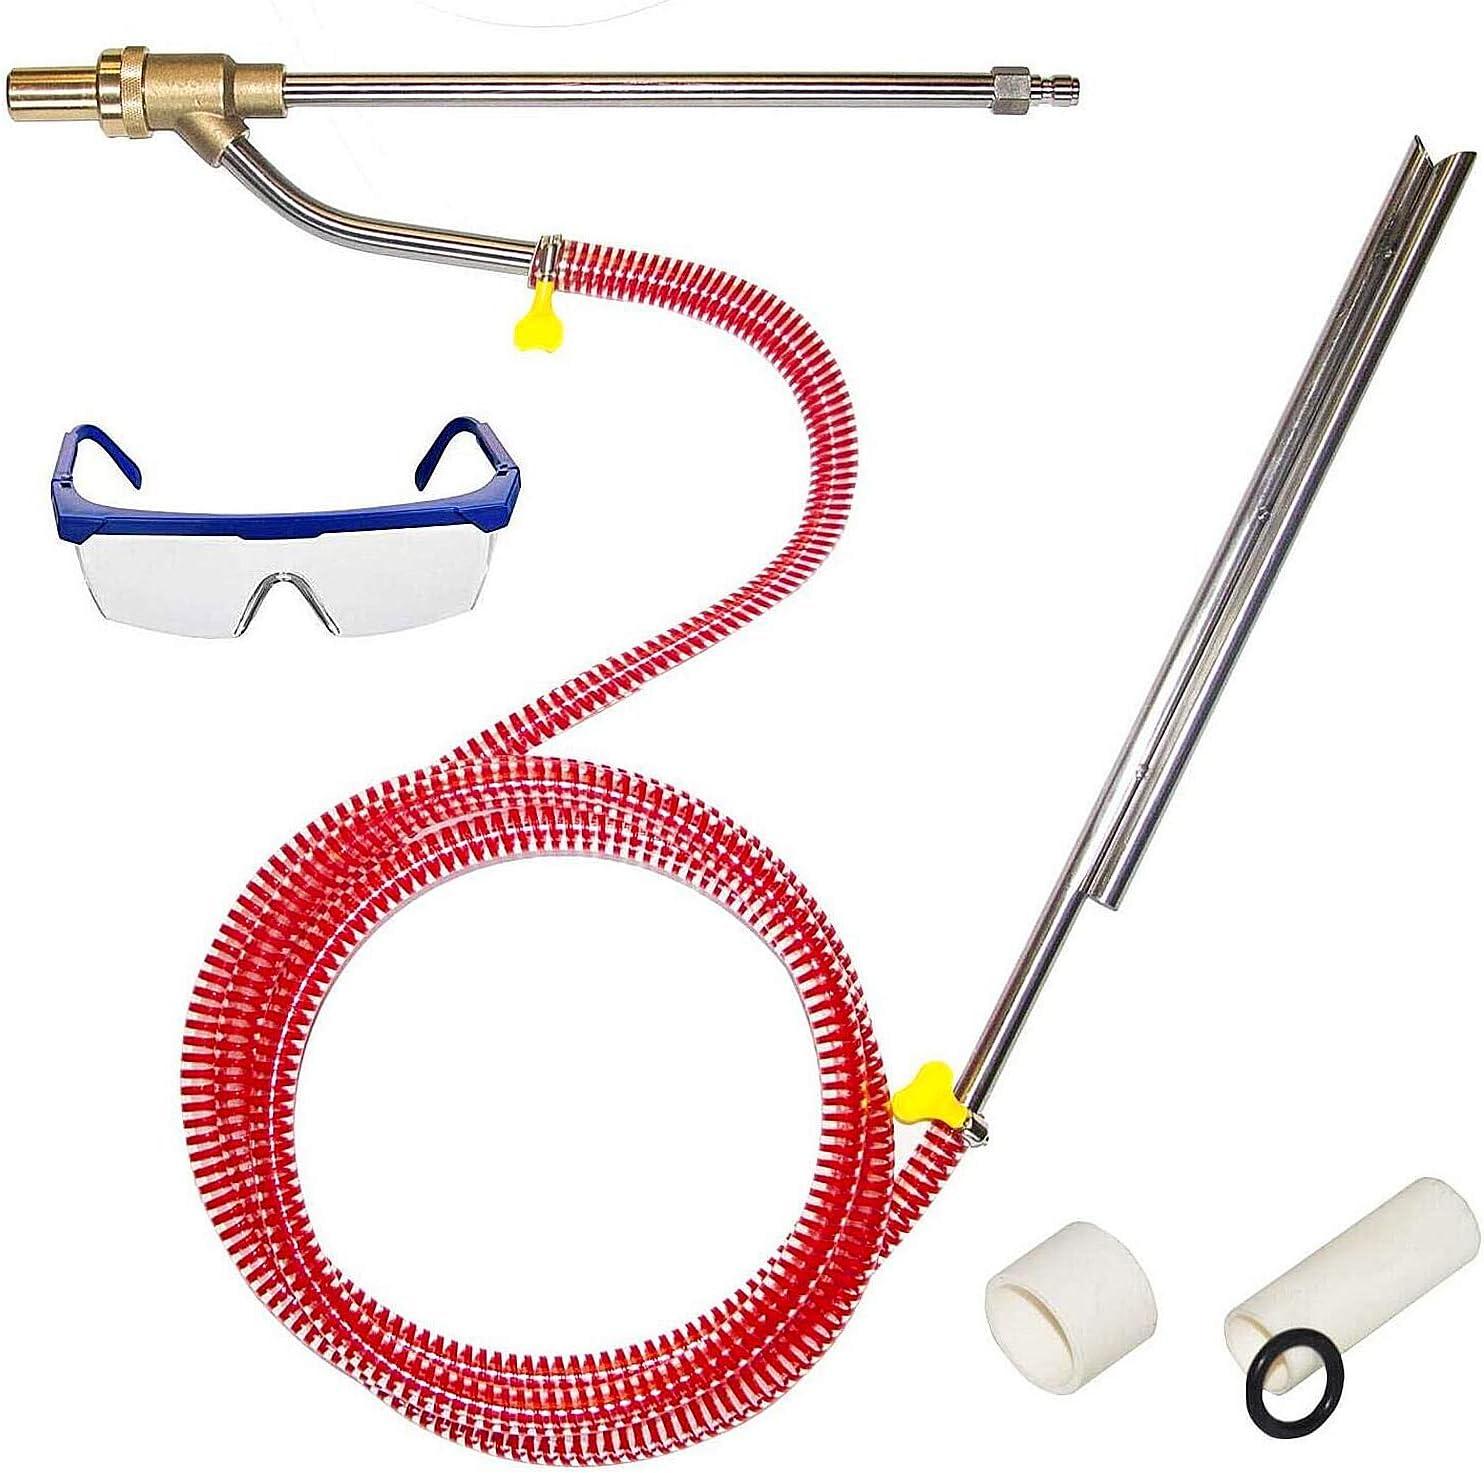 Twinkle Star Pressure Washer Sandblasting Kit, Wet Abrasive Sandblaster Attachment, Dustless Sand Blasting Kit, 1/4 Inch Quick Disconnect, 5000 PSI